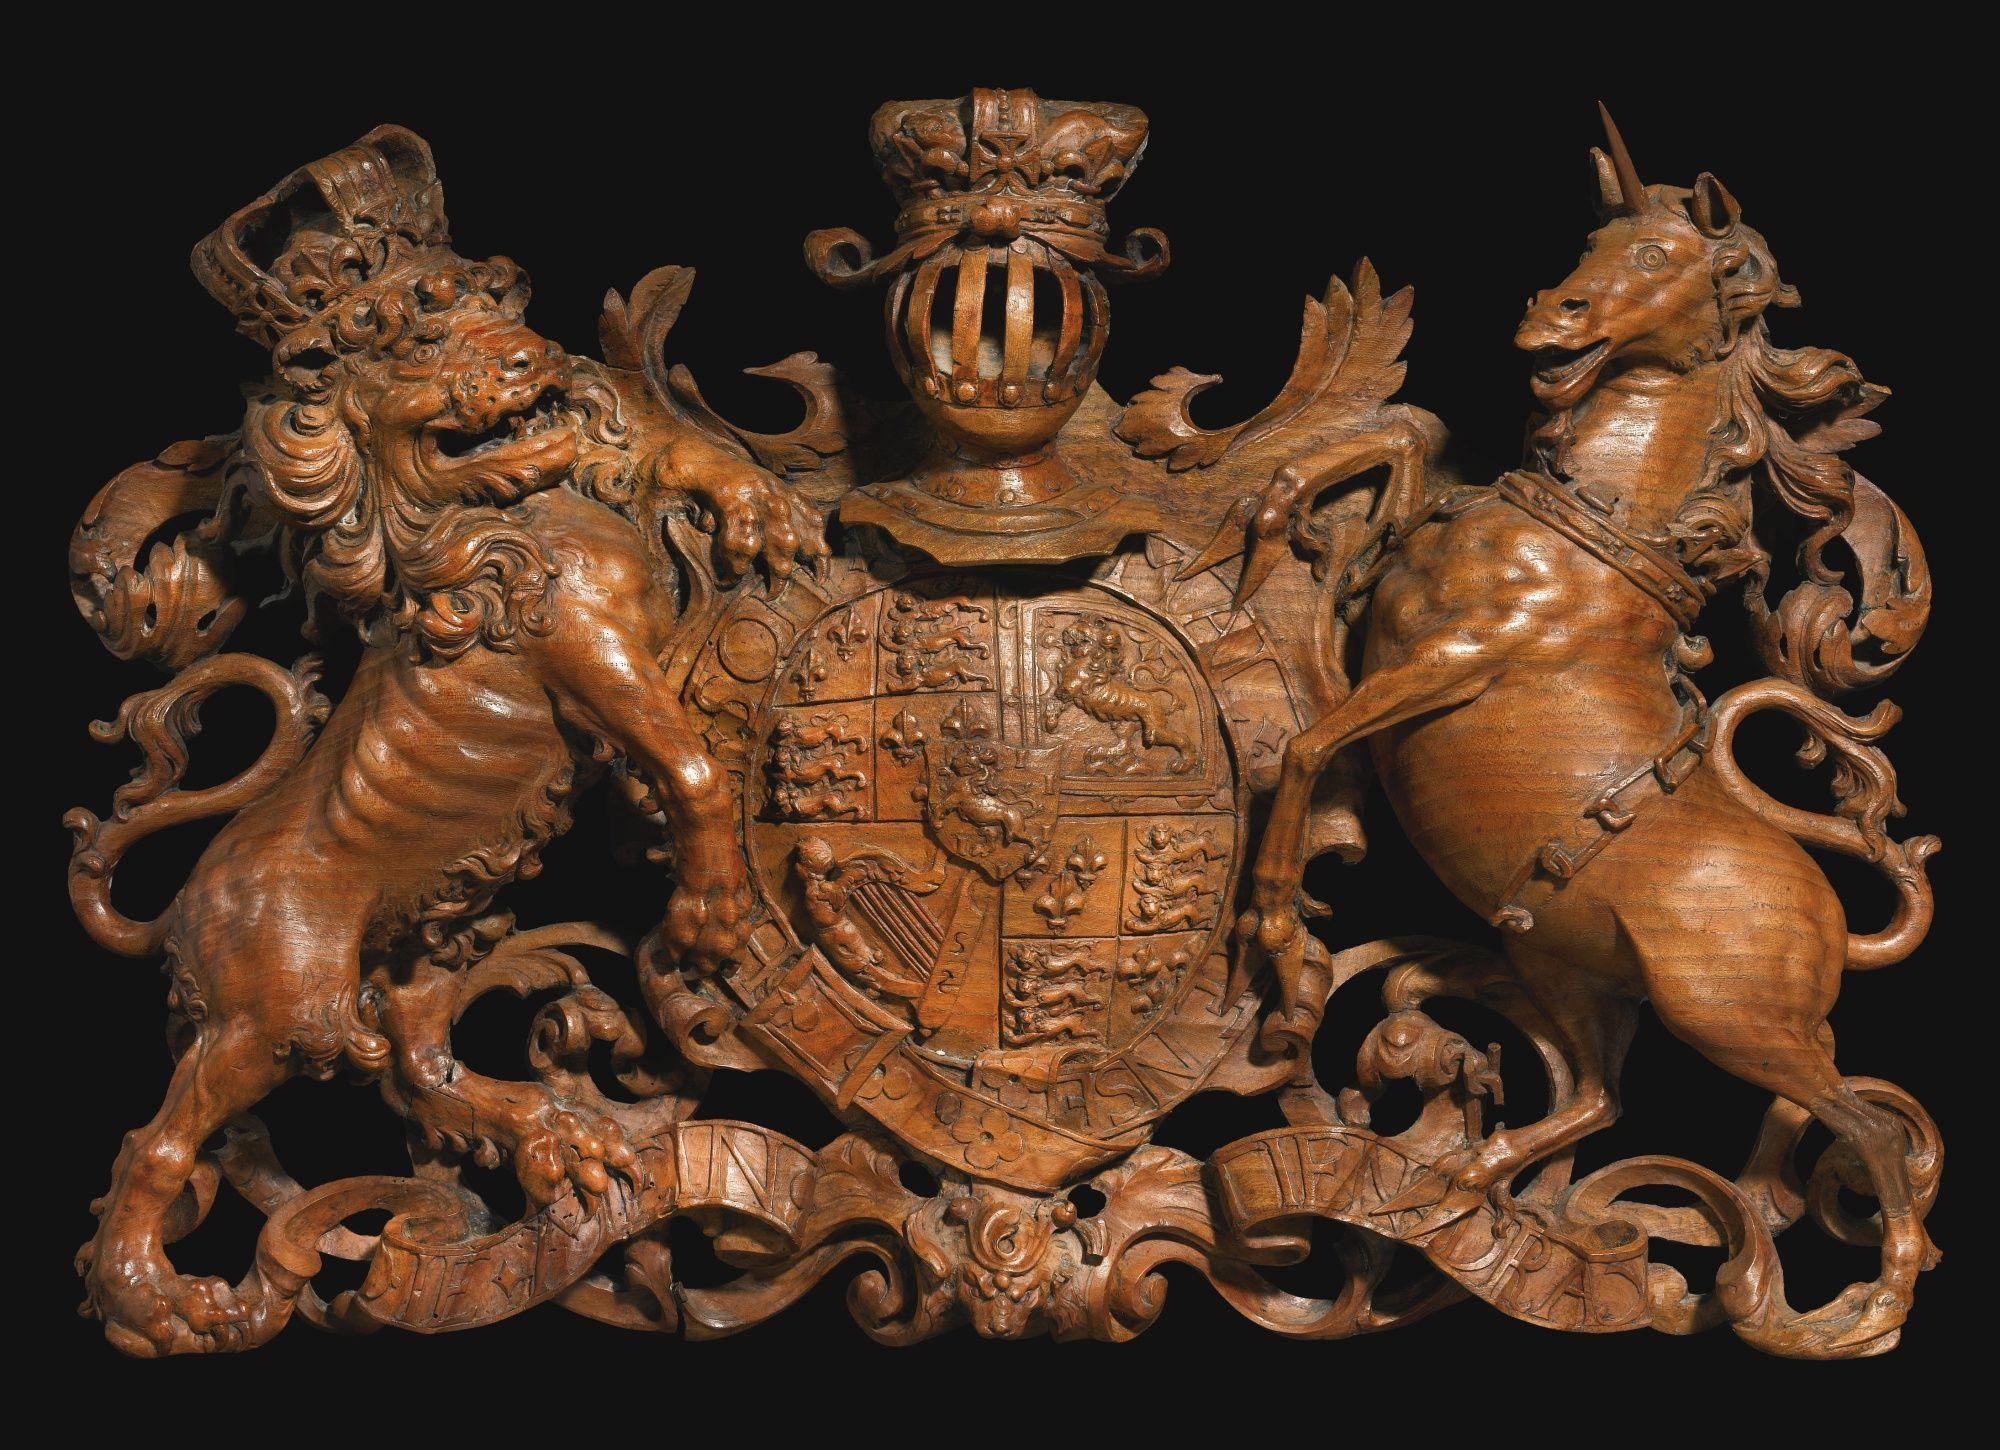 COAT OF ARMS OF WILLIAM III OF